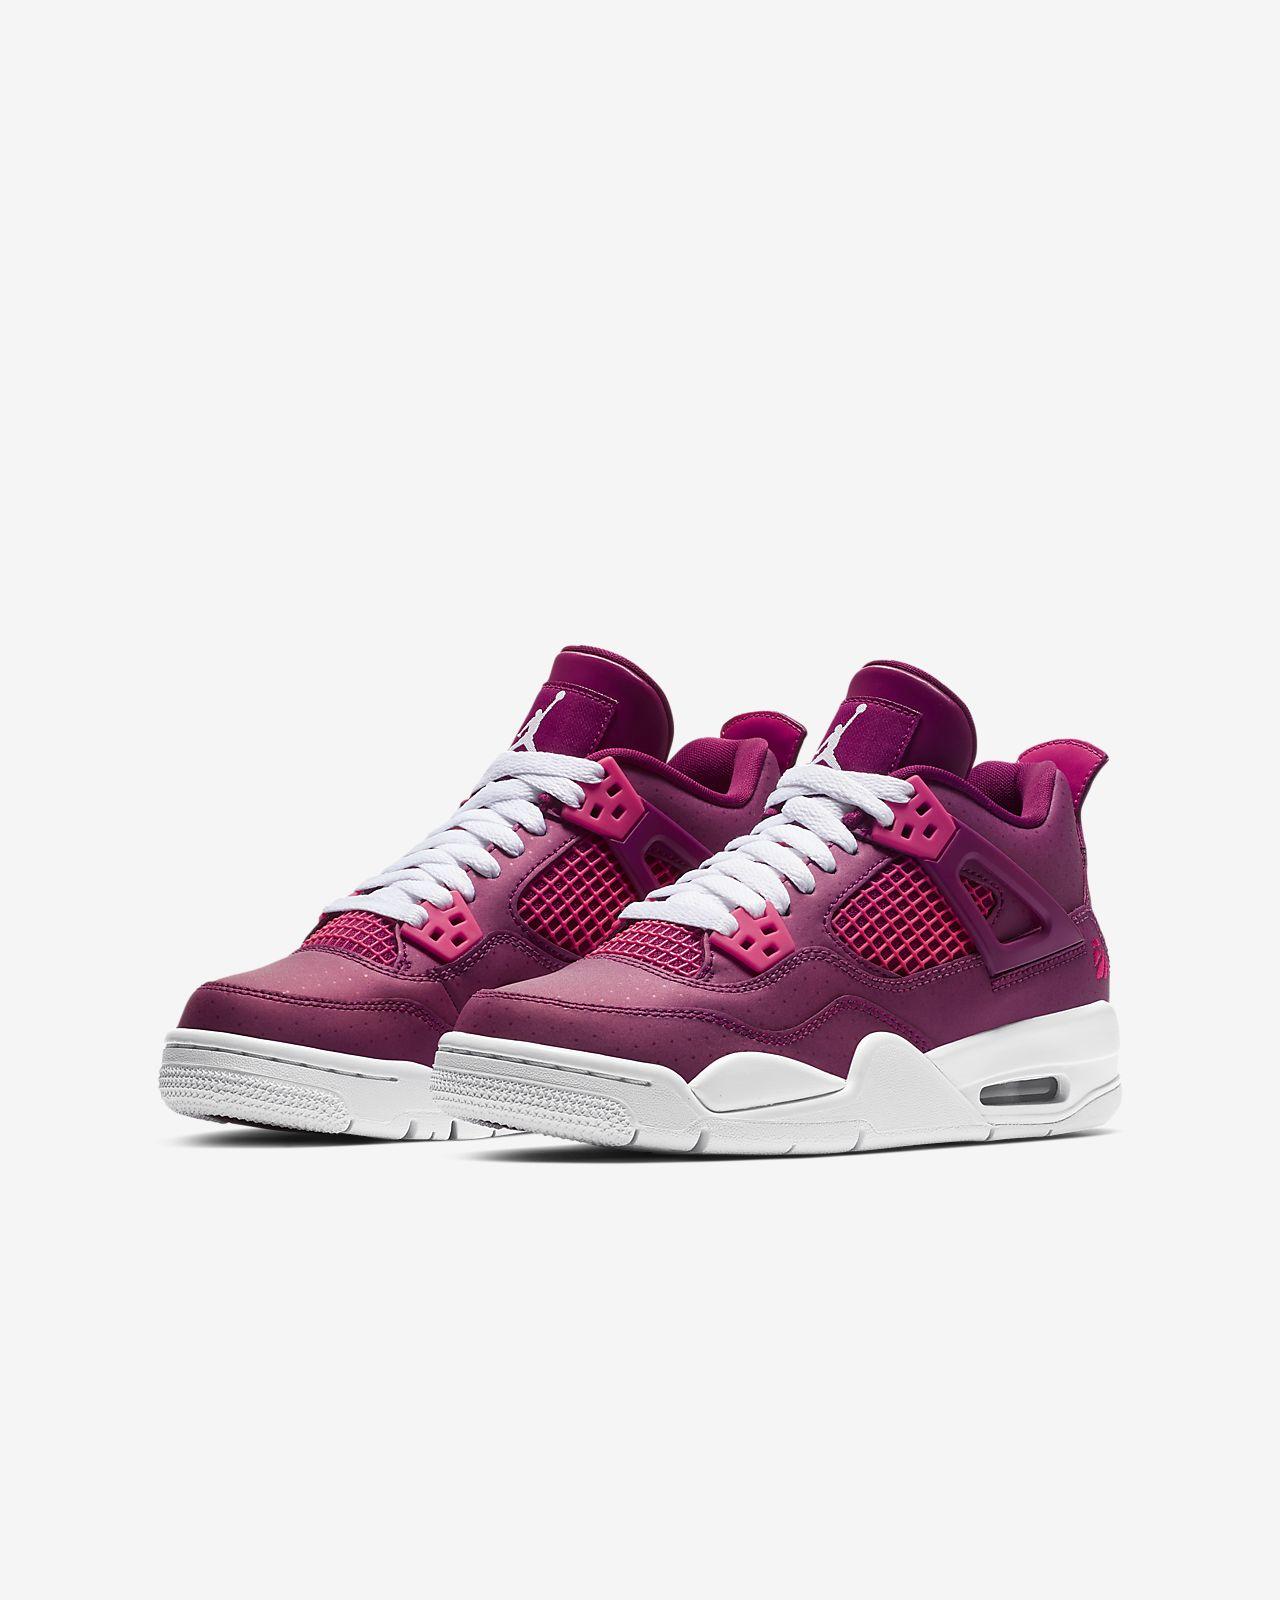 0c7f9e0a7d09b8 Air Jordan 4 Retro Big Kids  Shoe. Nike.com